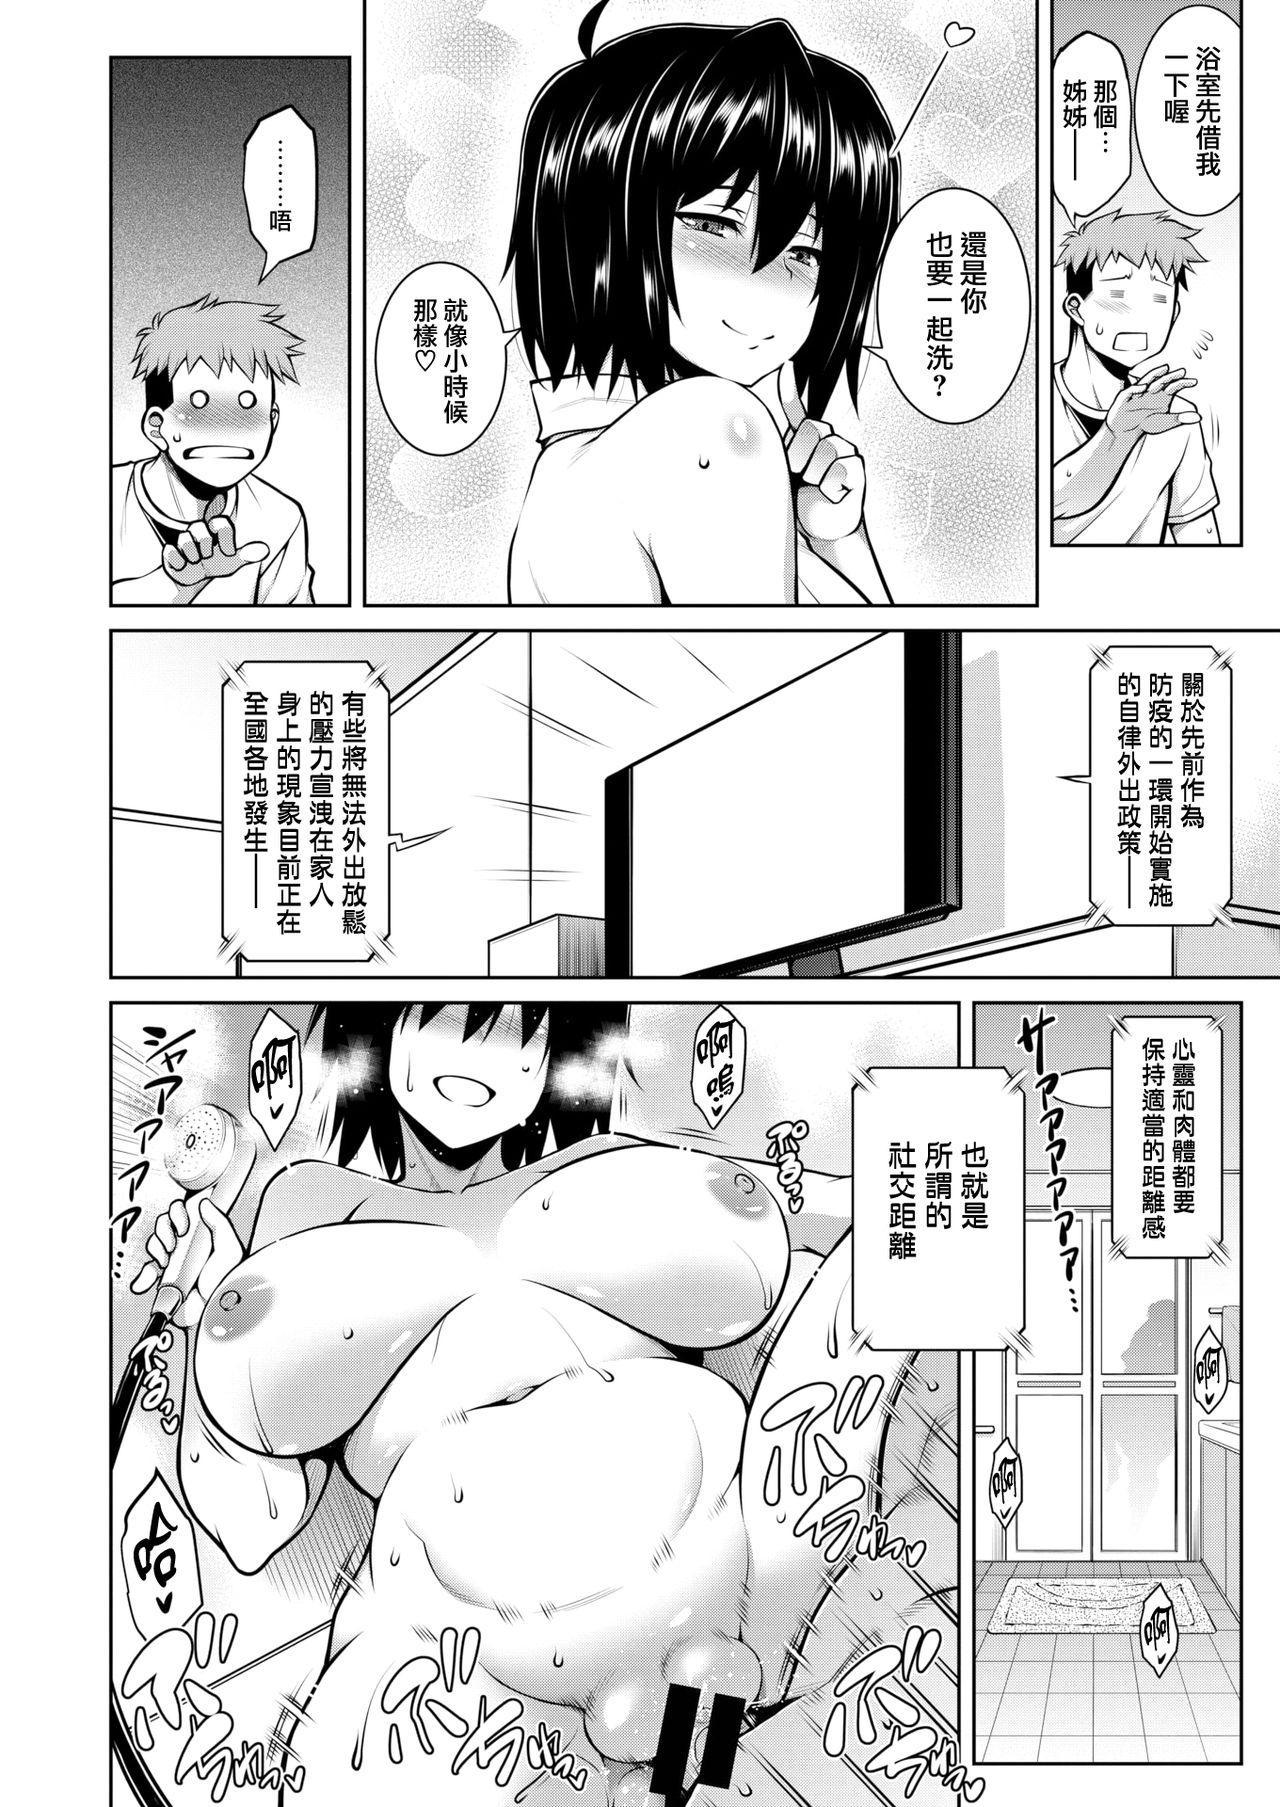 Yamikomori 7